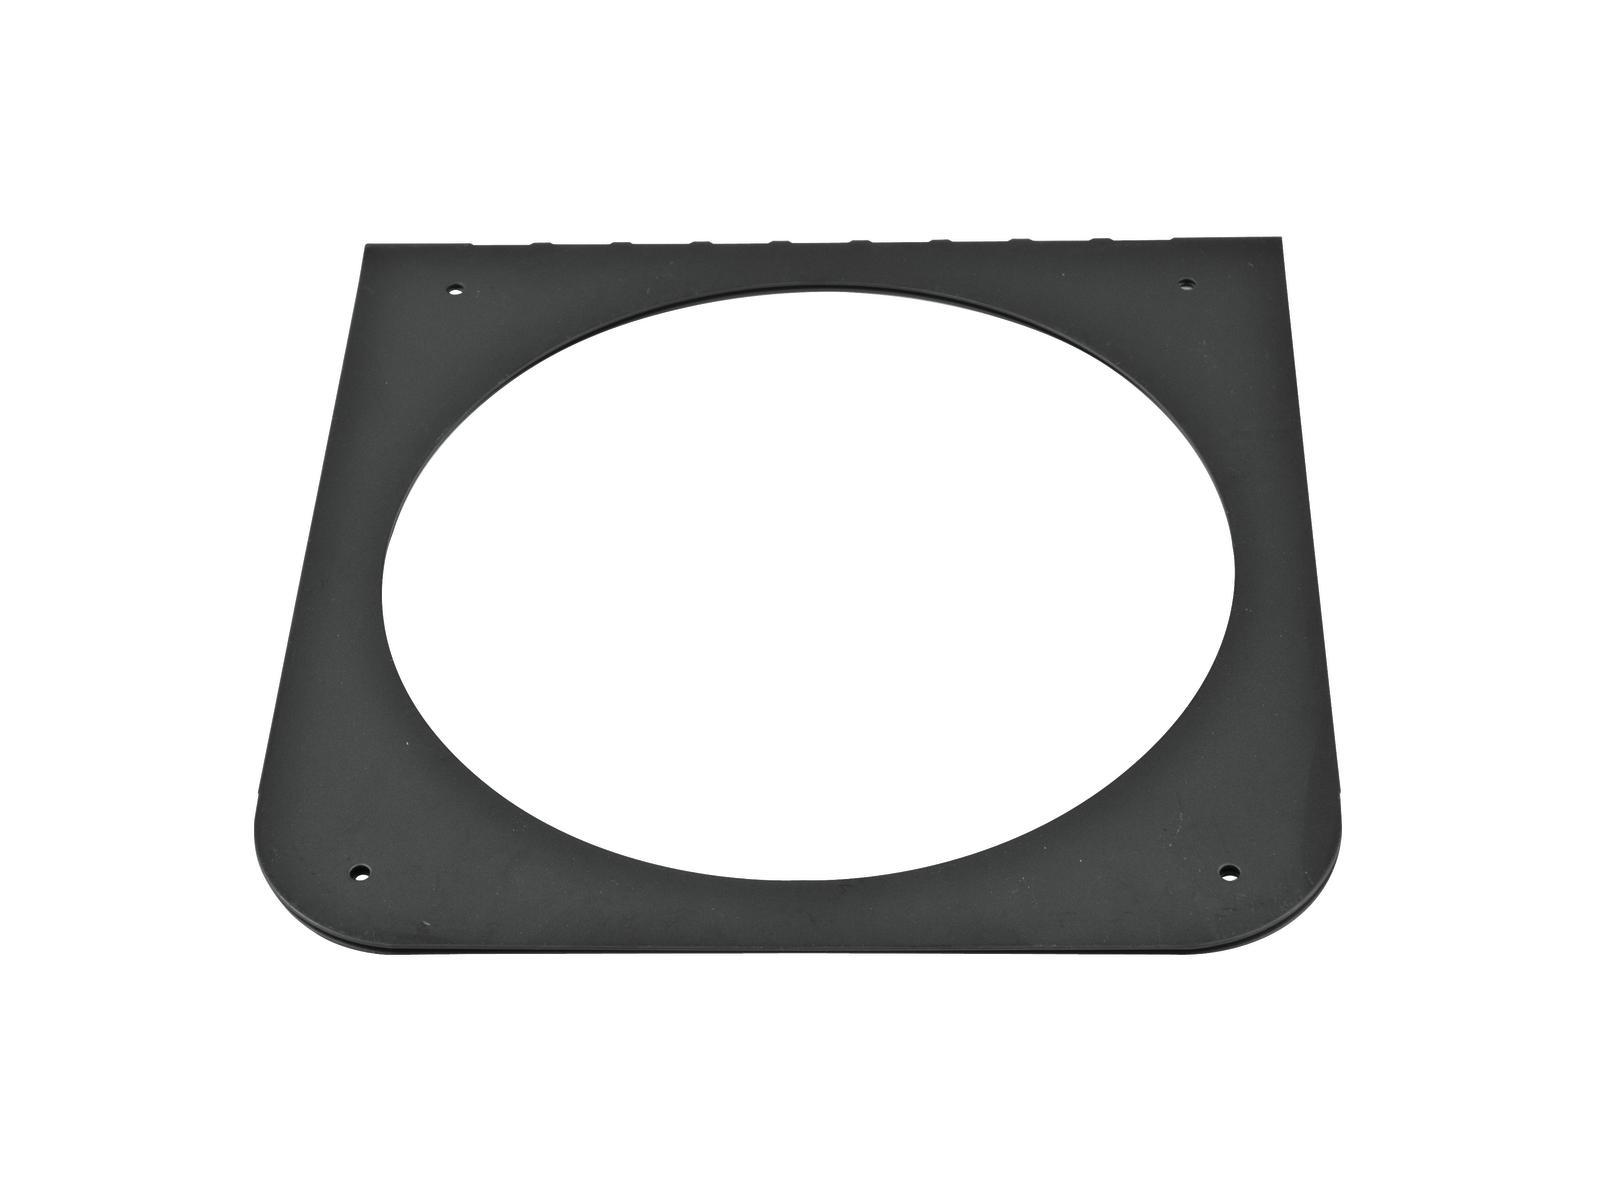 Rámeček na filtr 157 x 158 mm černý